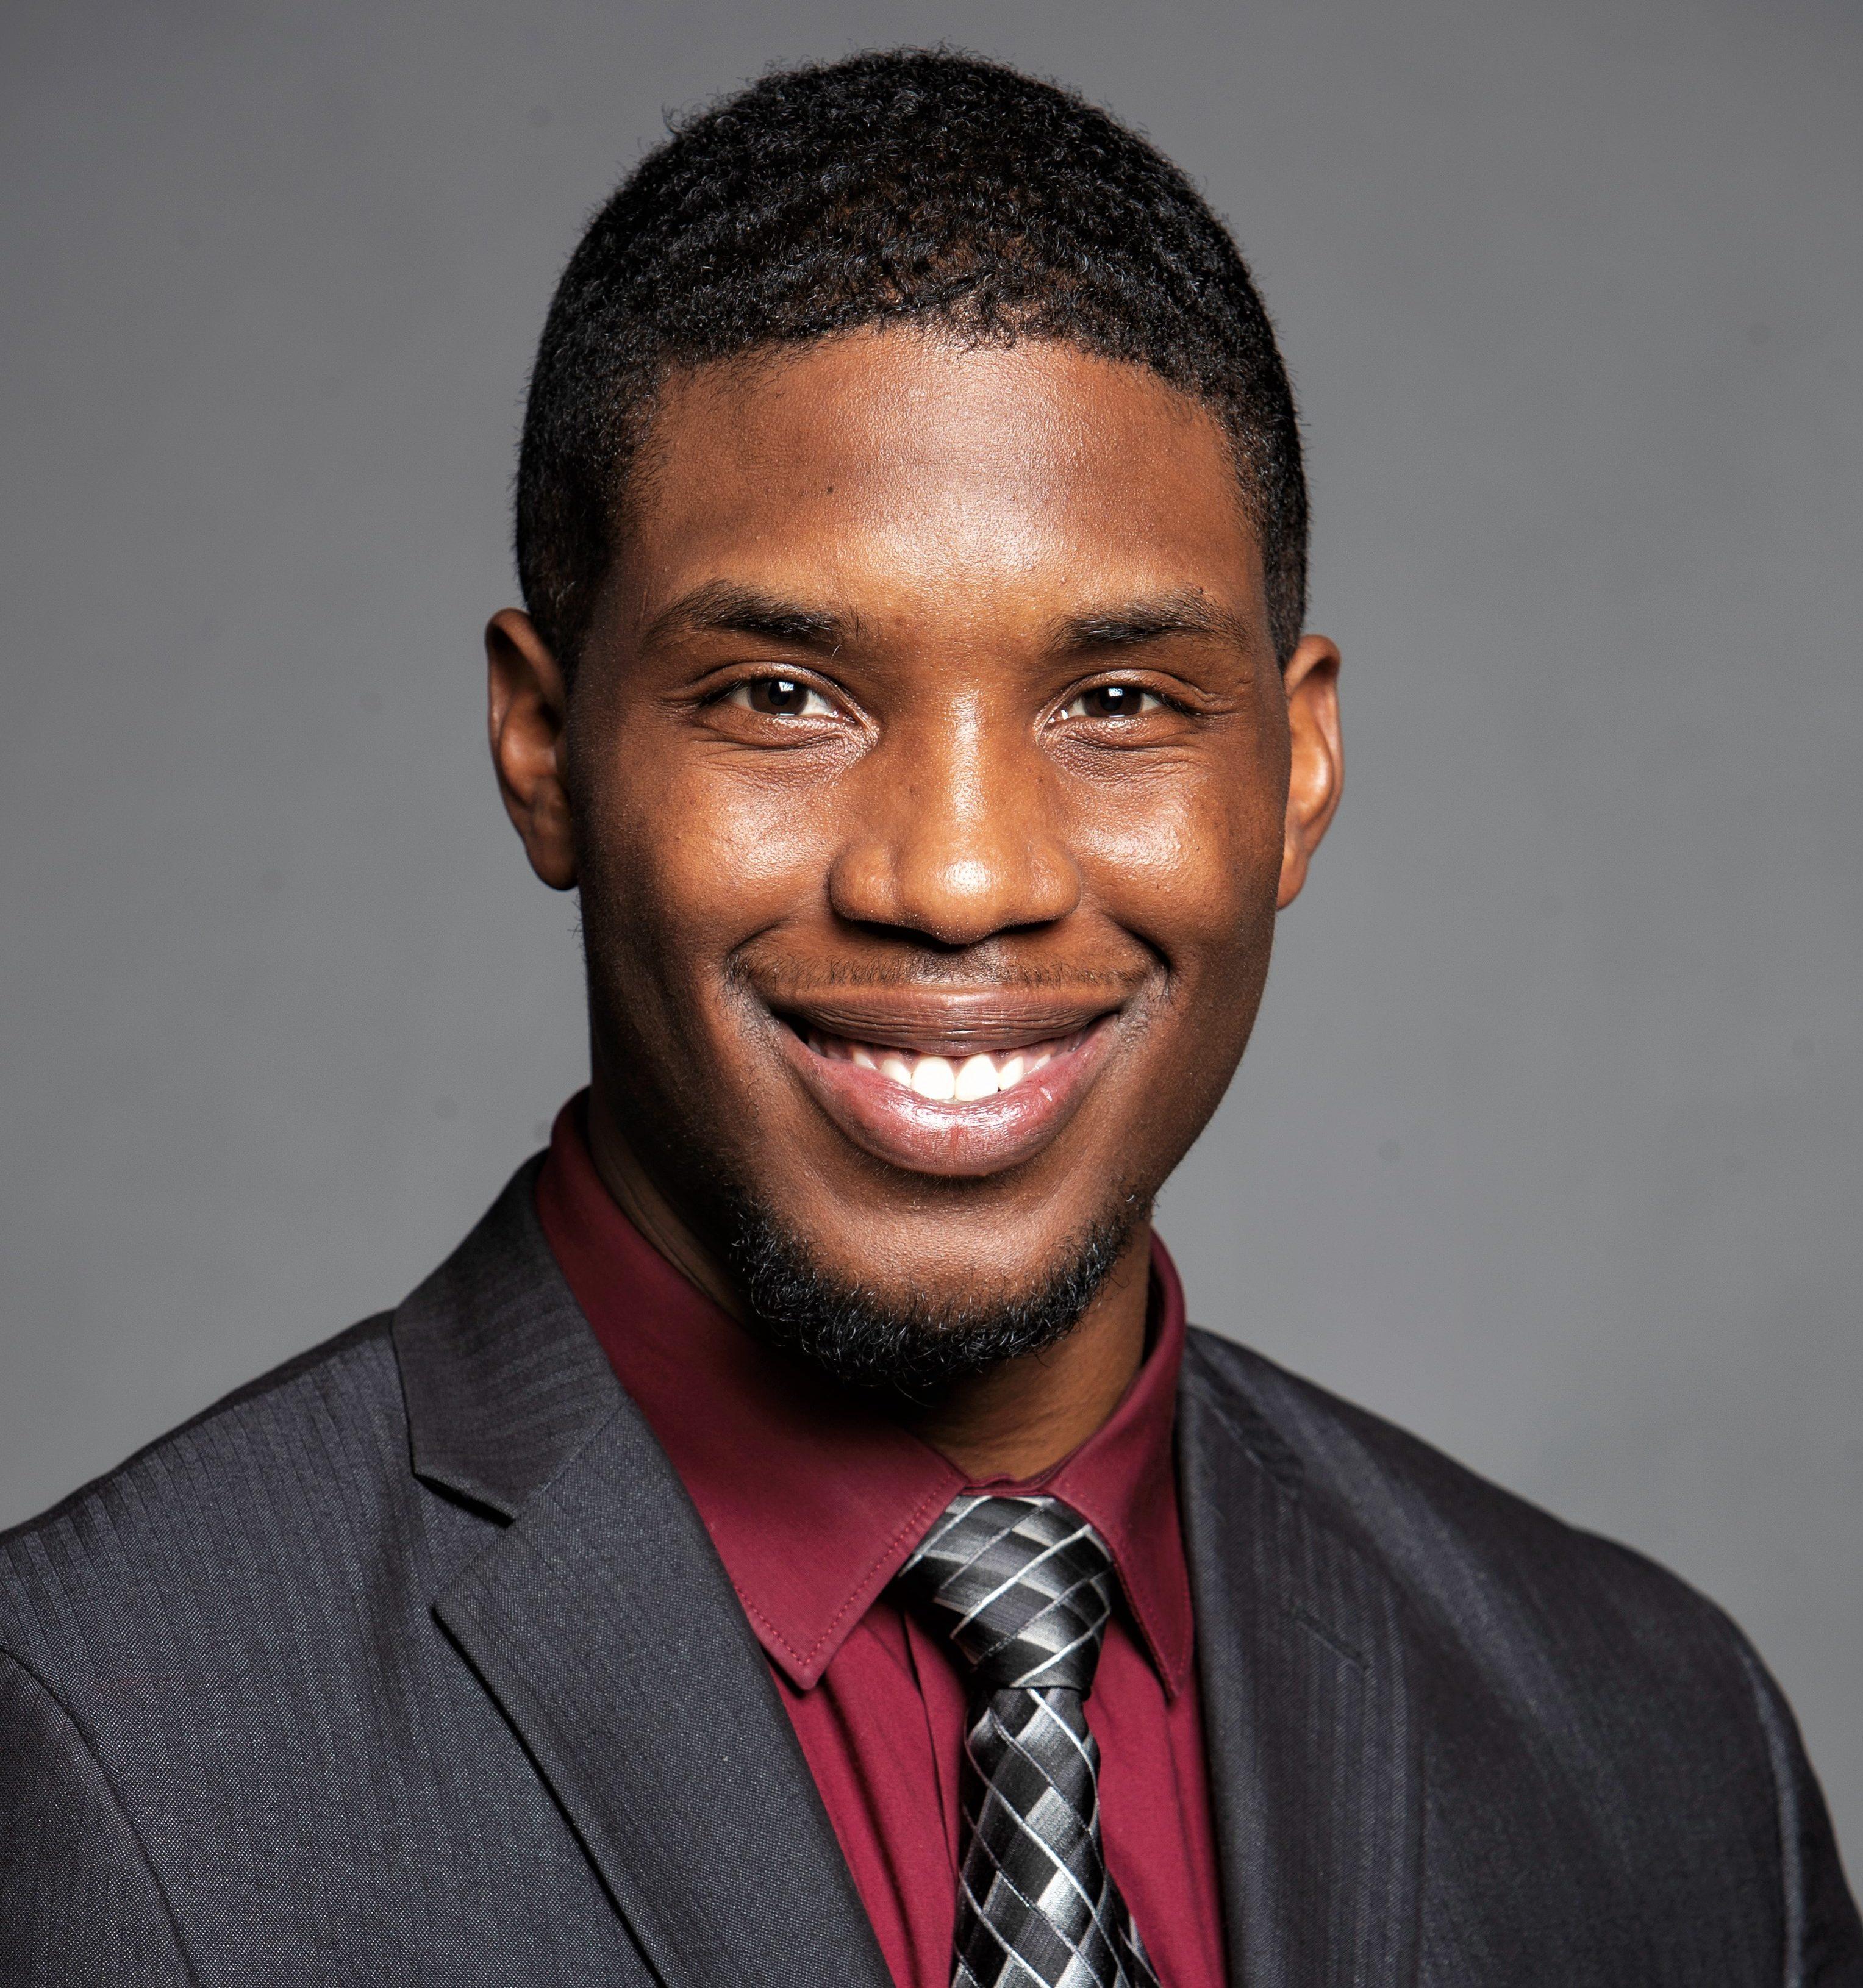 Joshua Edmonds